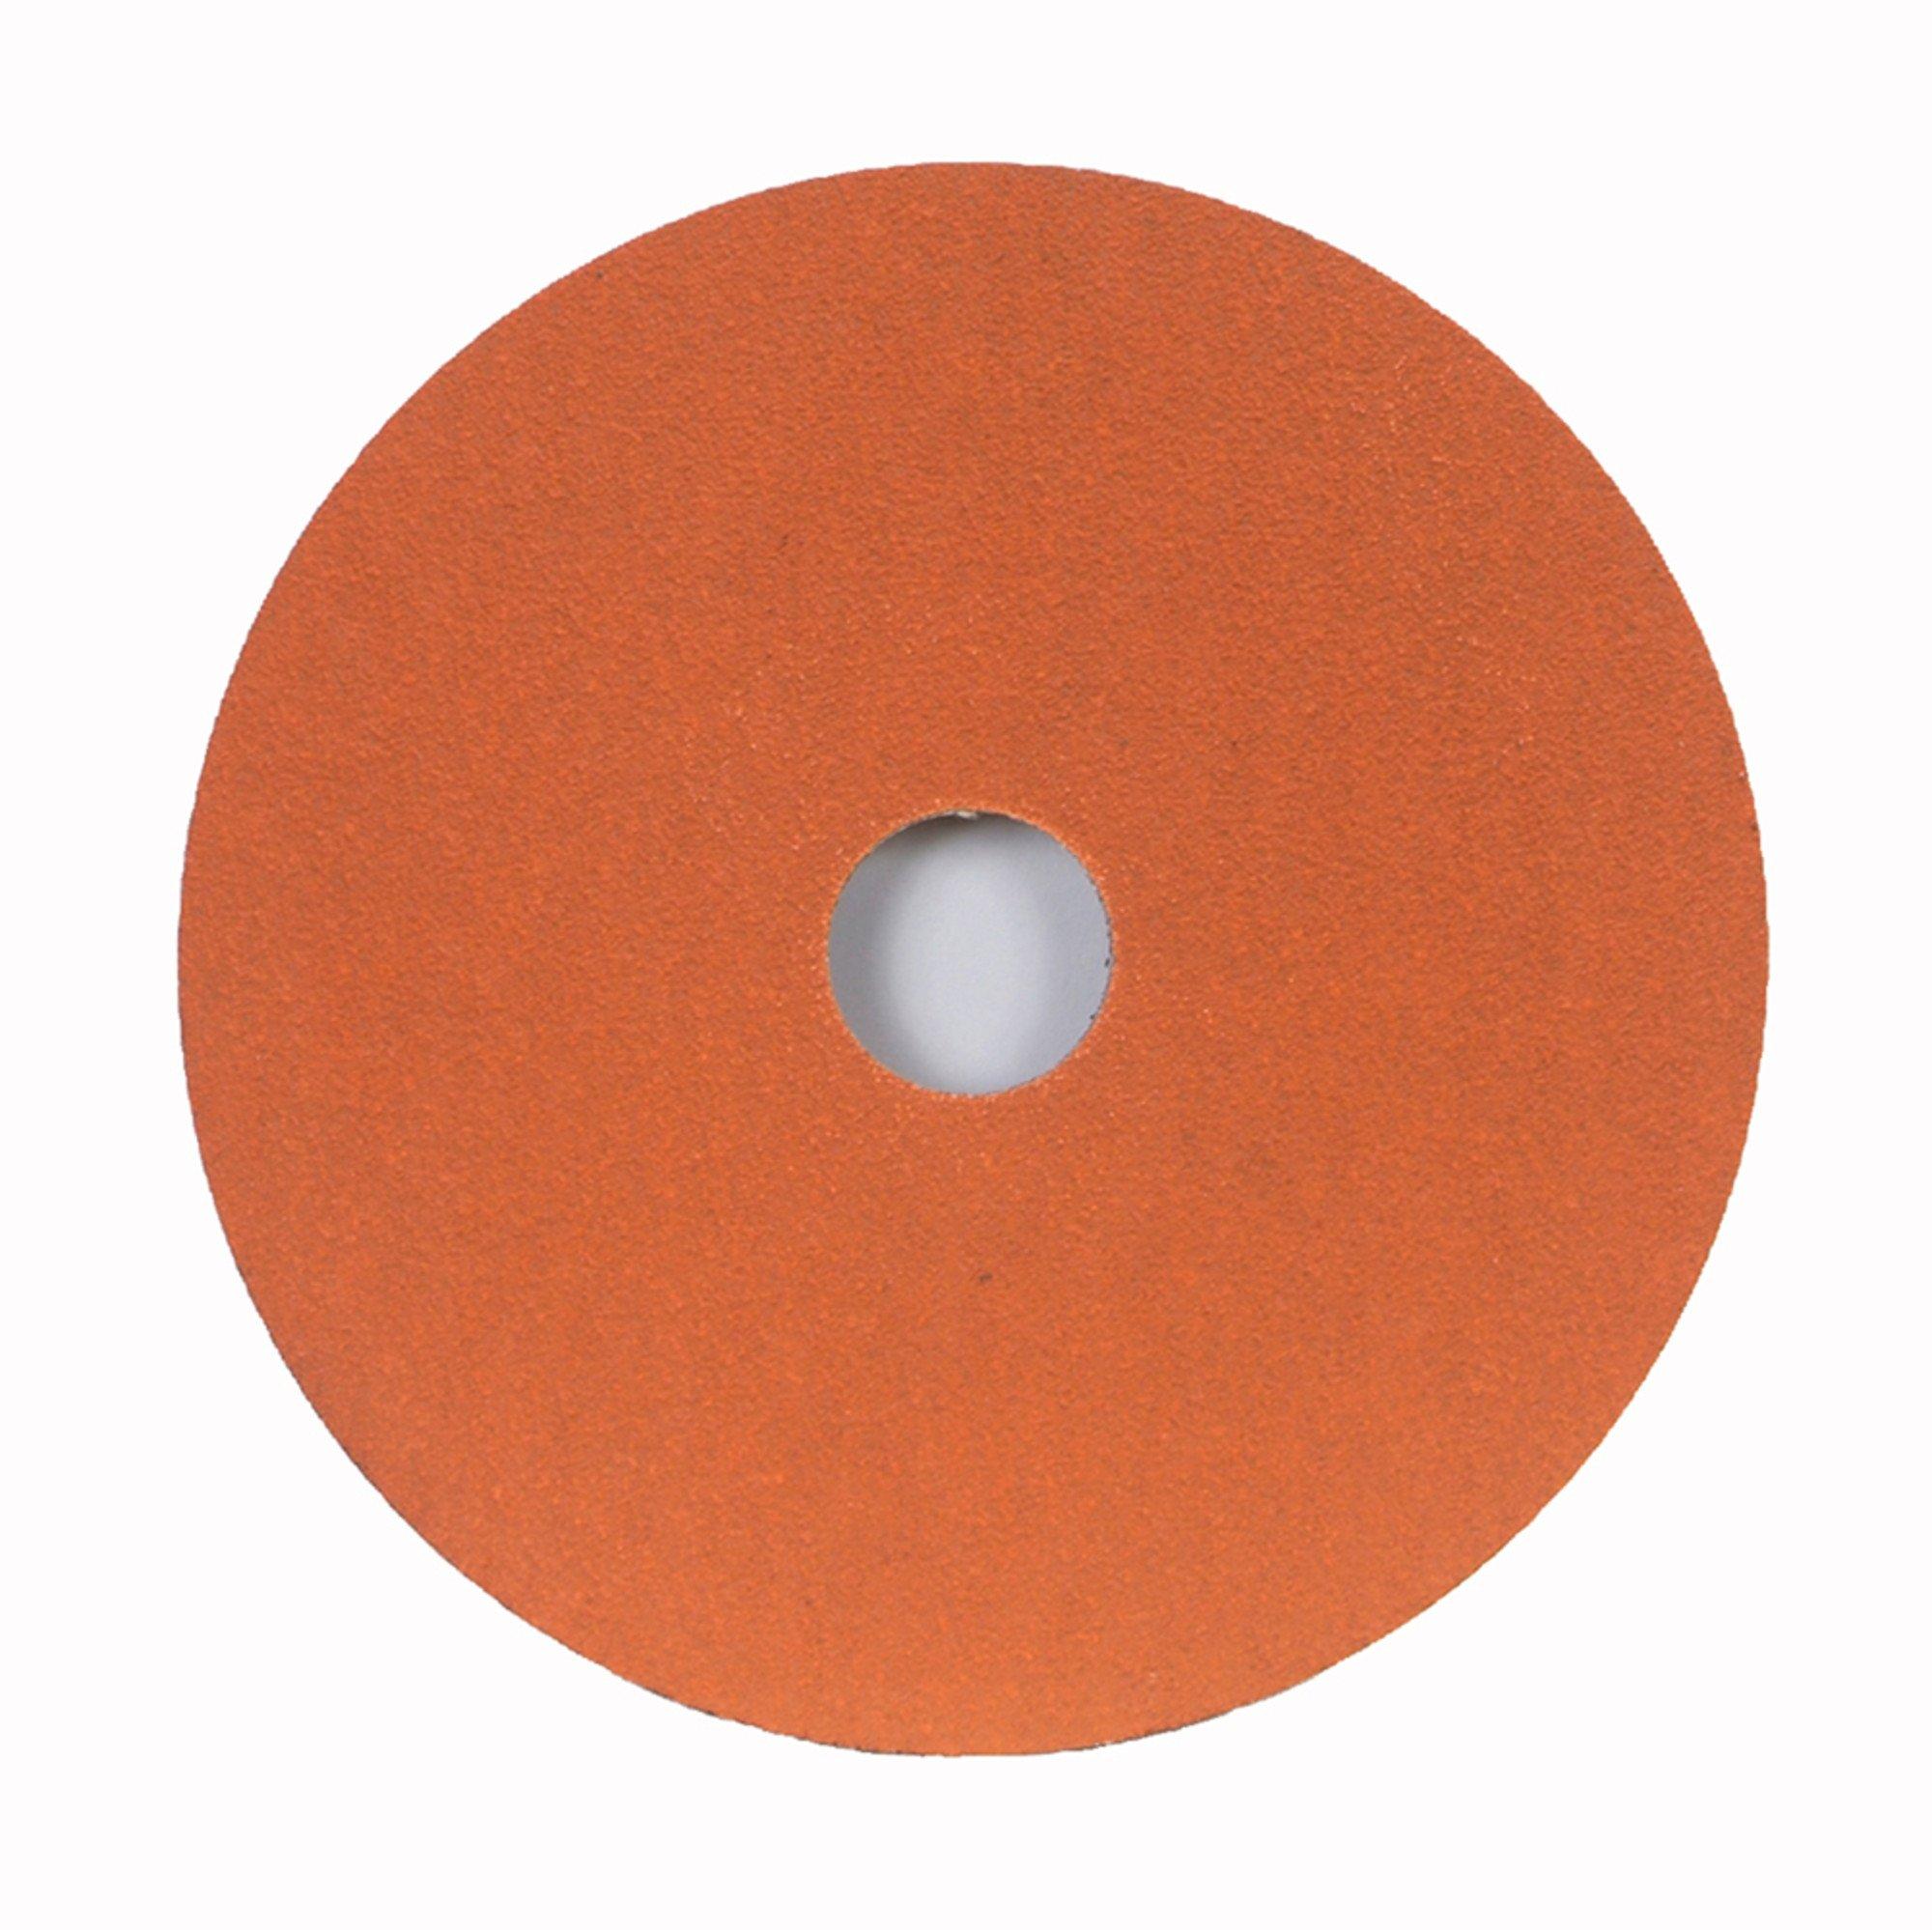 Norton SG Blaze F980 Abrasive Disc, Fiber Backing, Ceramic Aluminum Oxide, 7/8'' Arbor, 9-1/8'' Diameter, Grit 24 (Box of 25)